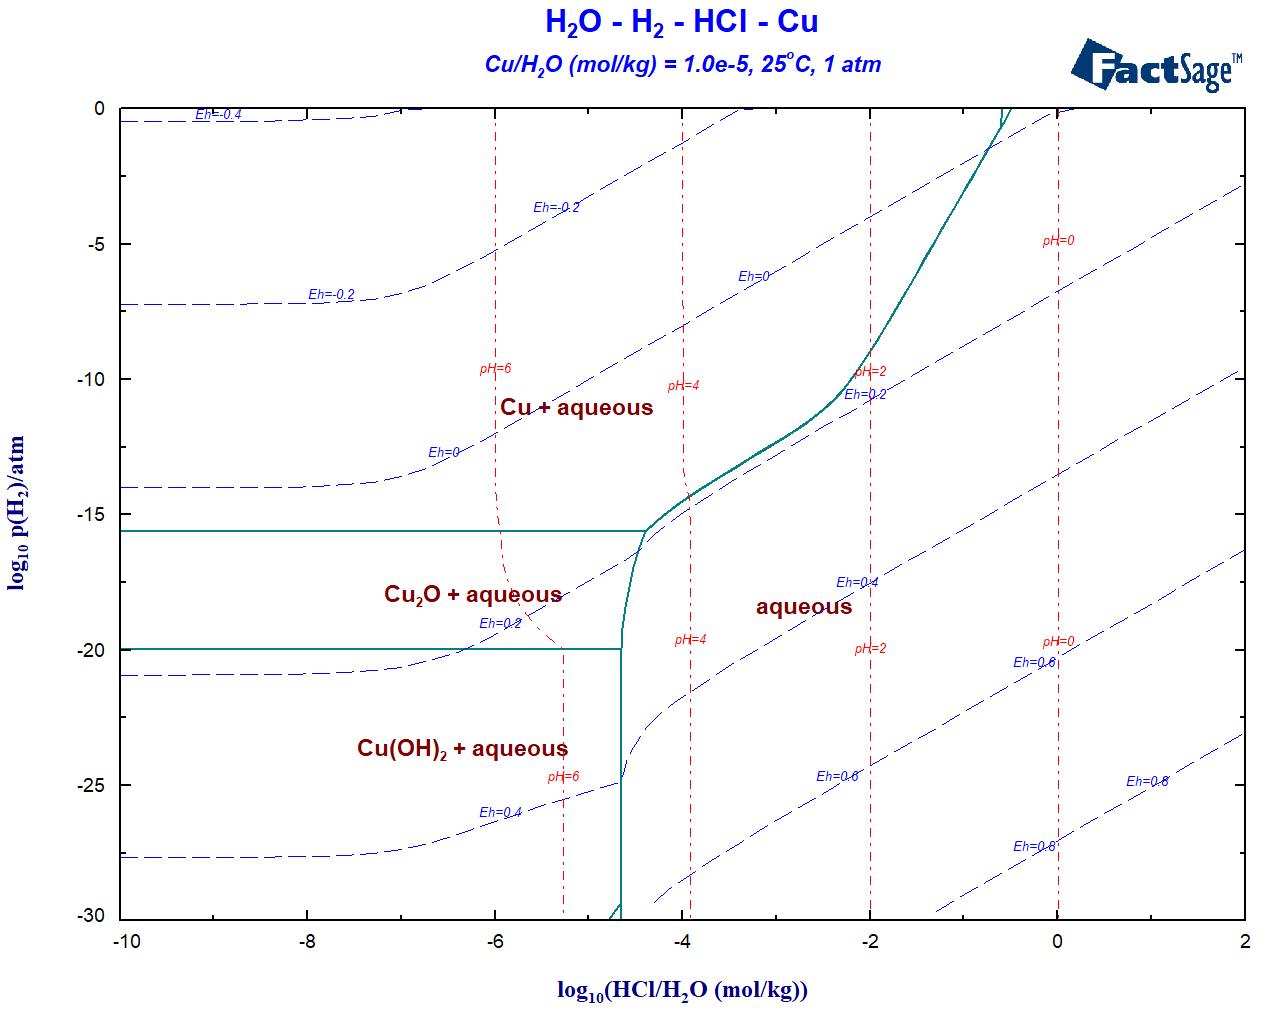 Whats new in factsage 72 gtt technologies 1 log10p2 vs log10phclph2o aqueous h2o h2 hcl cu phase diagram at m cu1e 5 25oc pooptronica